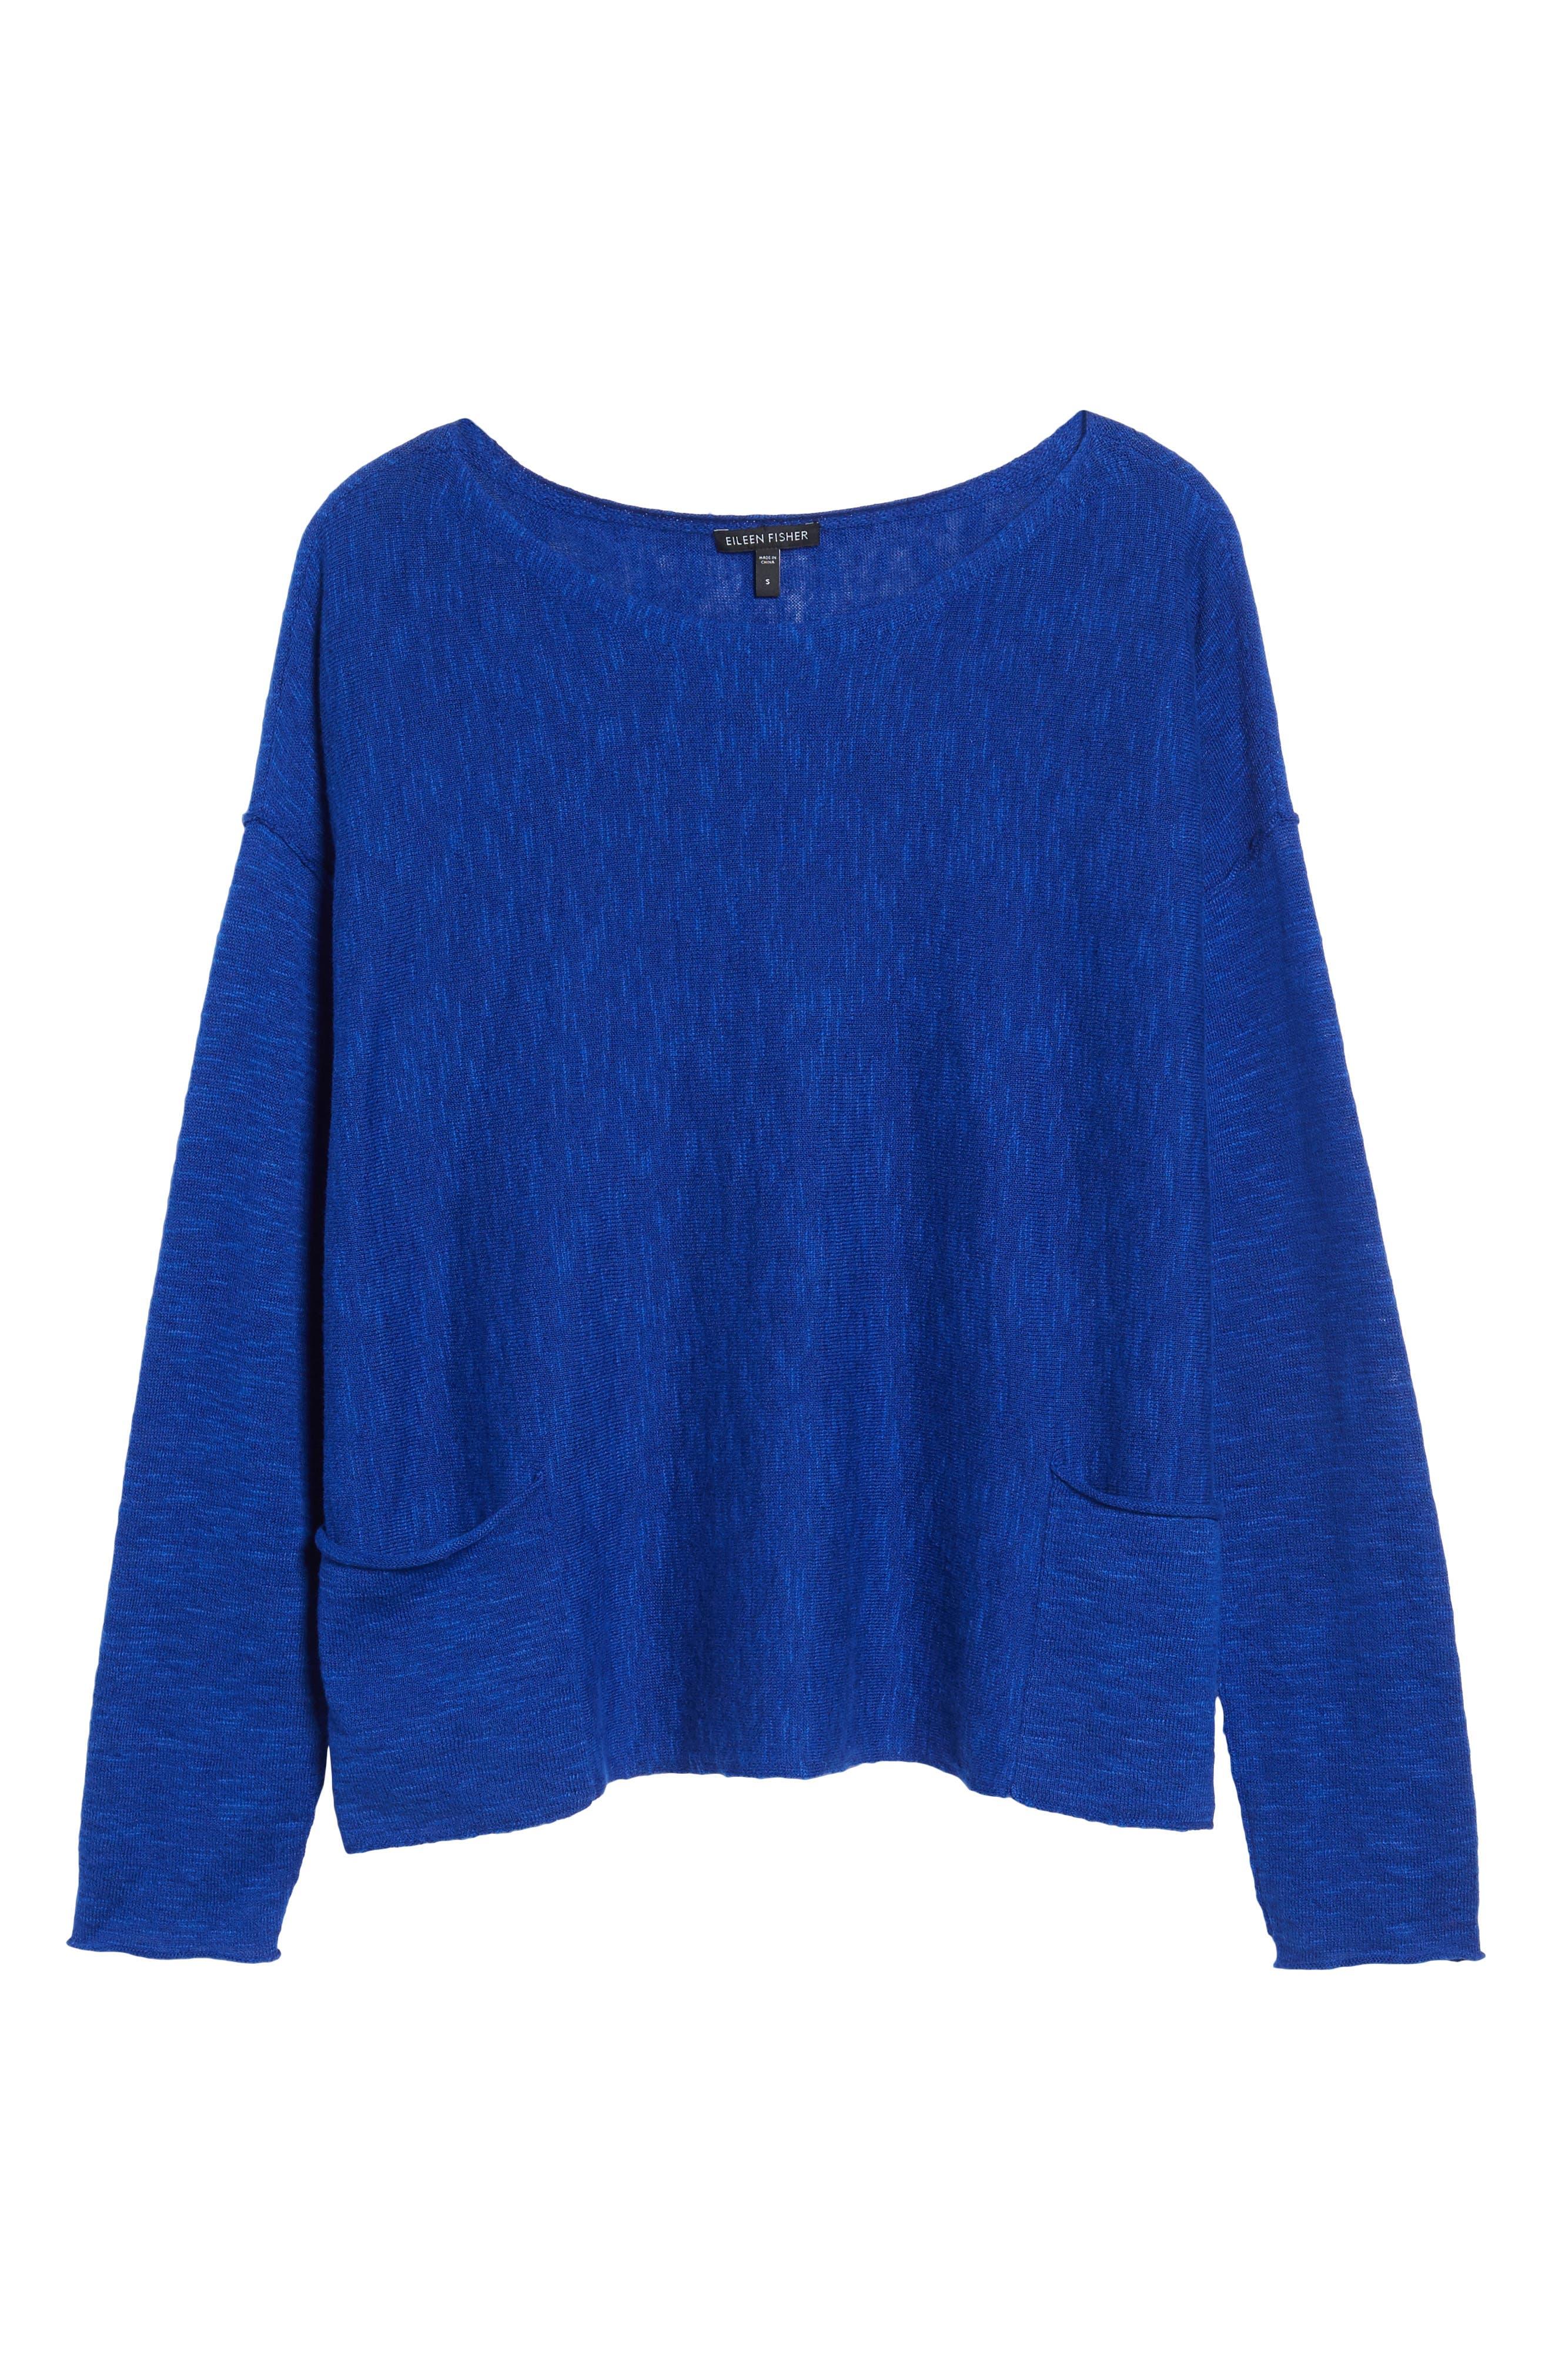 Organic Linen & Cotton Knit Boxy Top,                         Main,                         color, Royal